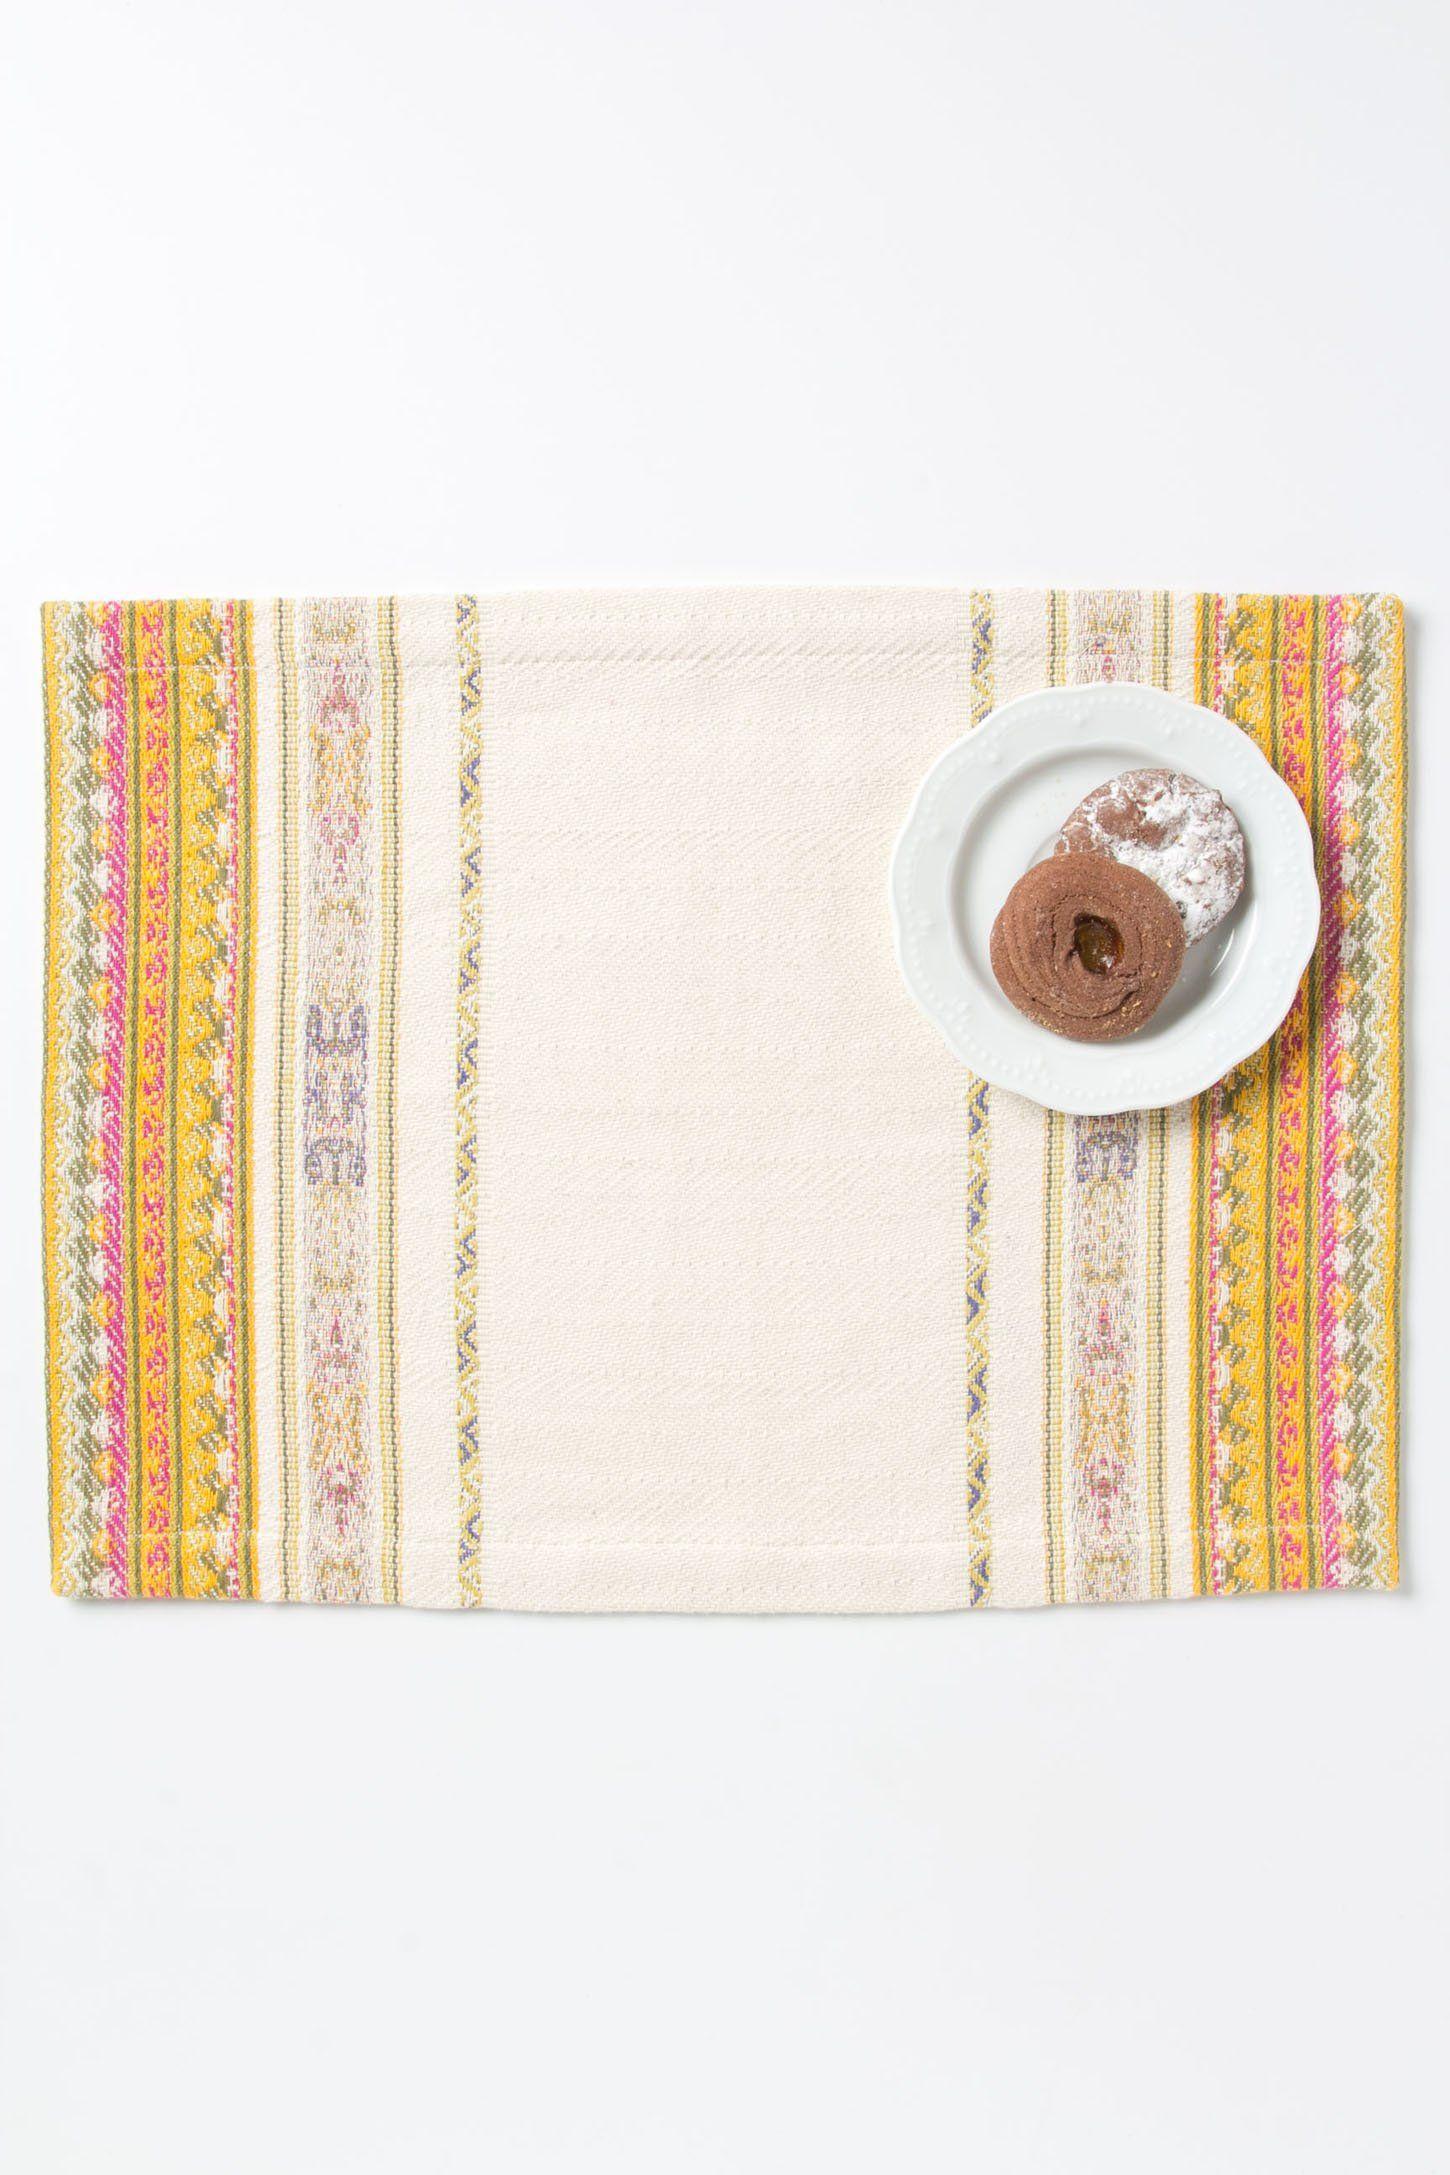 Woven Rhythms Placemat - $12